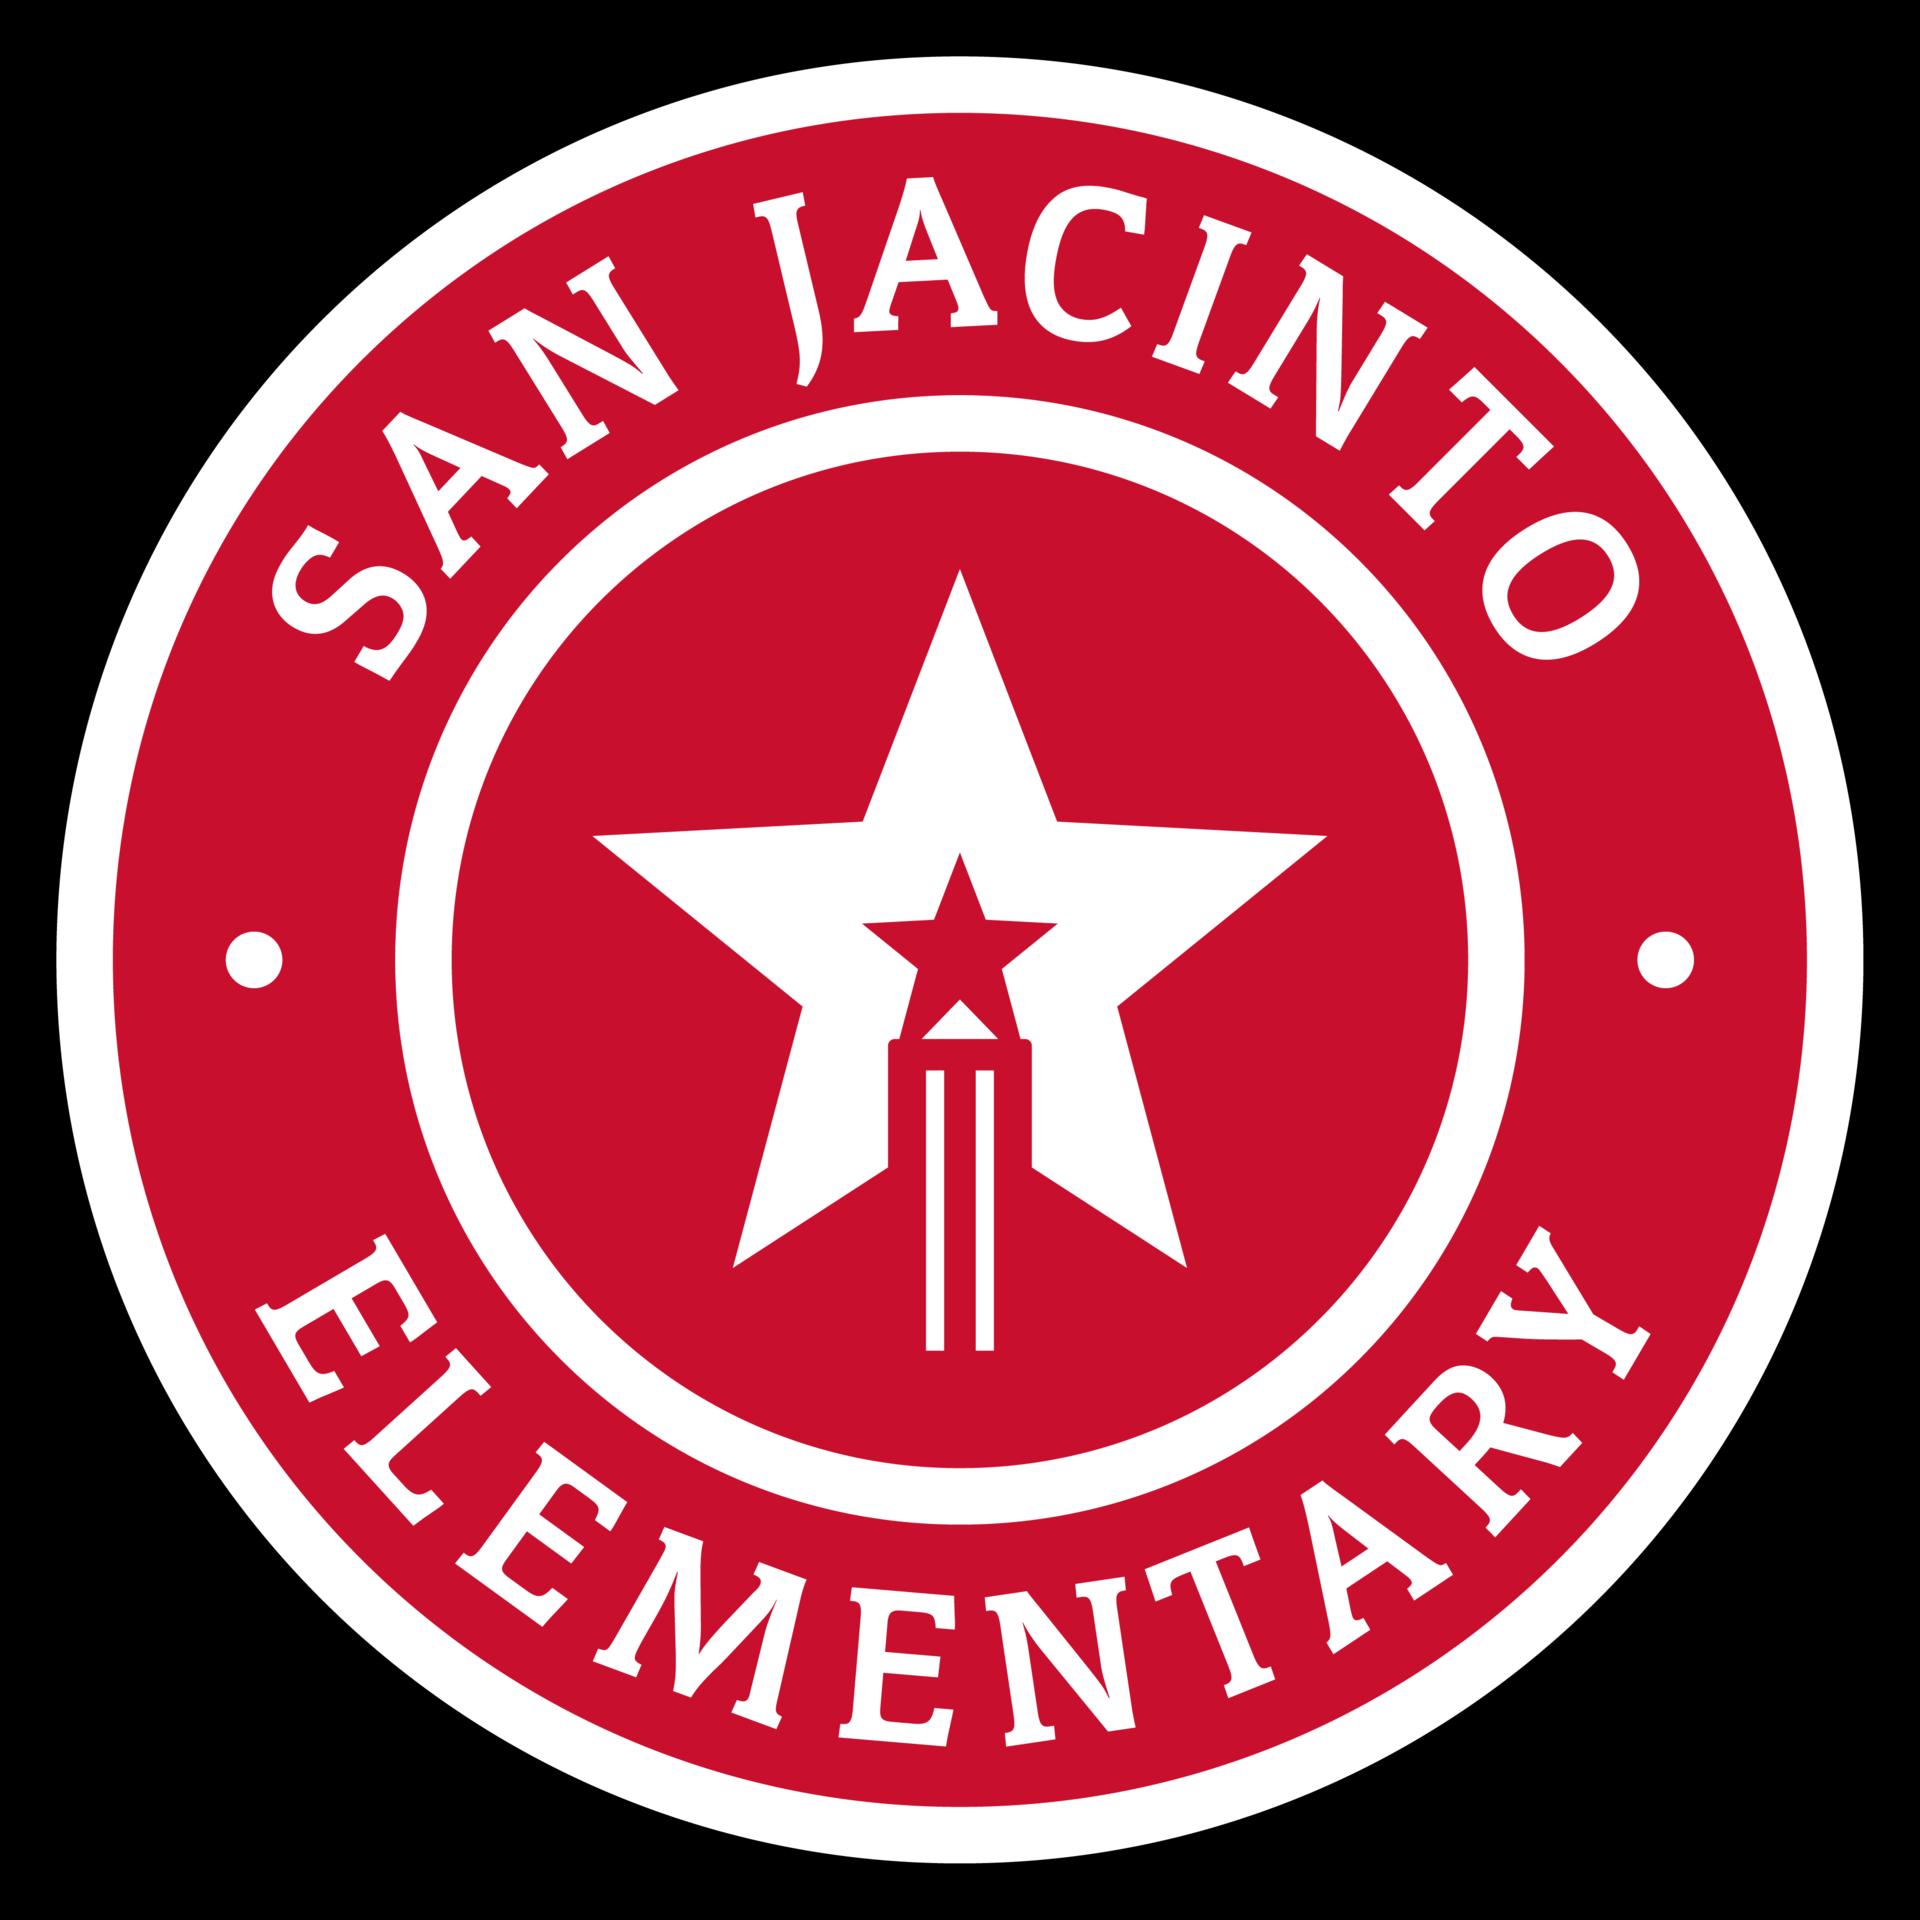 San Jacinto Elementary seal